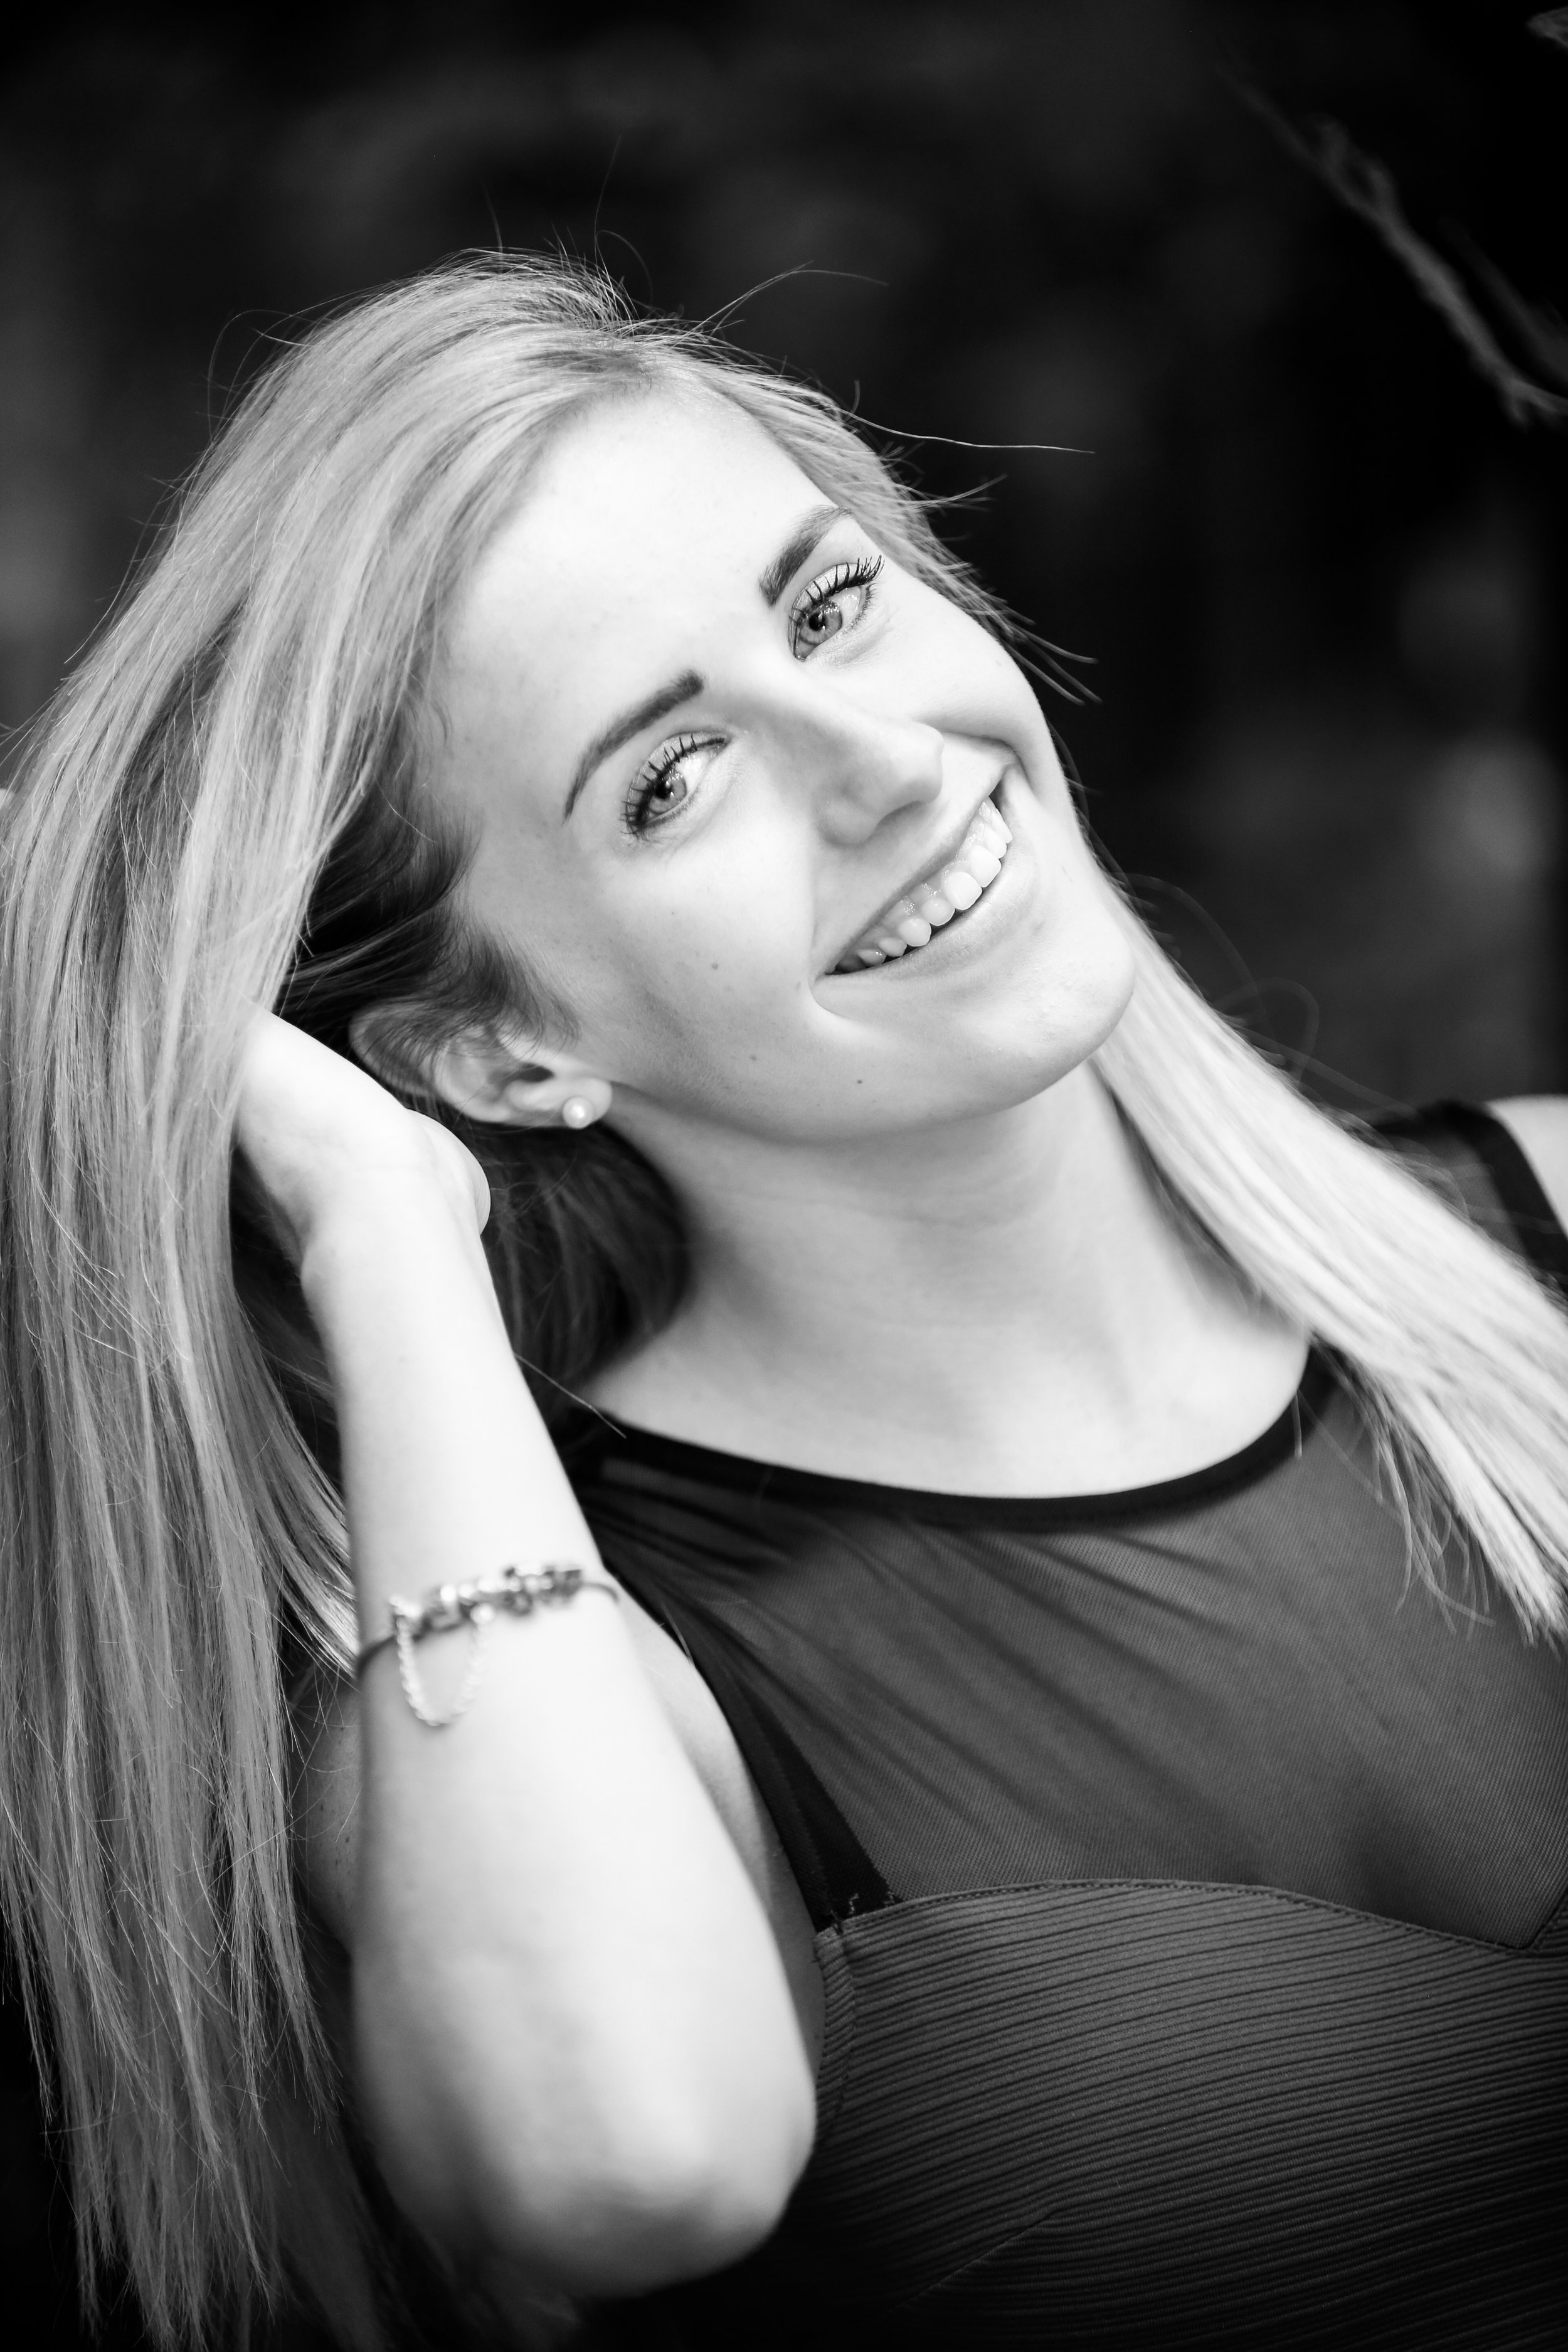 29 Schuetz, Megan Copy 1.jpg